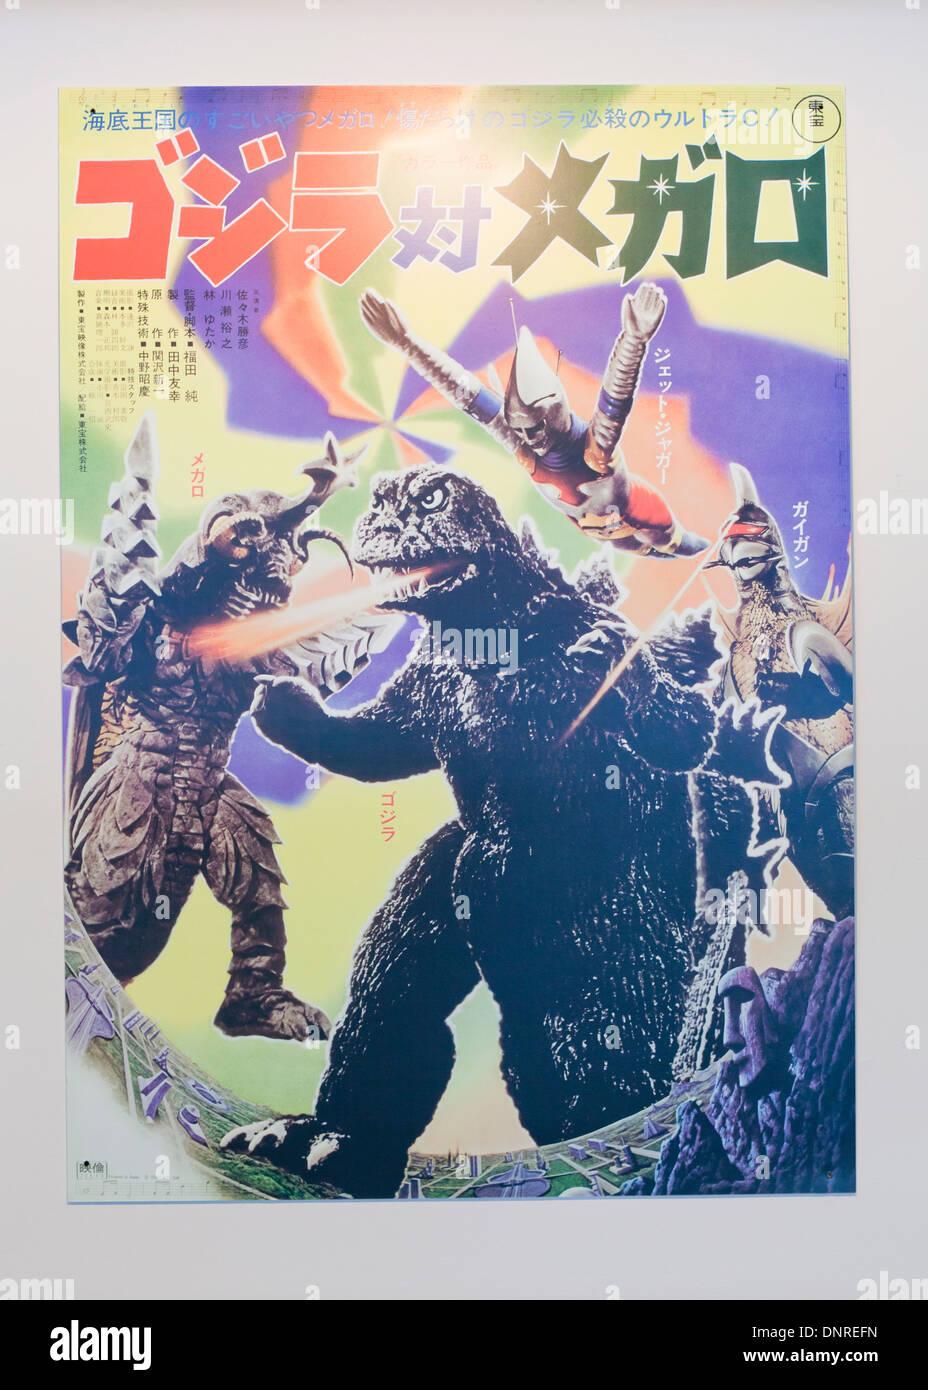 'Godzilla vs. Megalon' vintage Japanese monster movie poster, circa 1973 - Stock Image